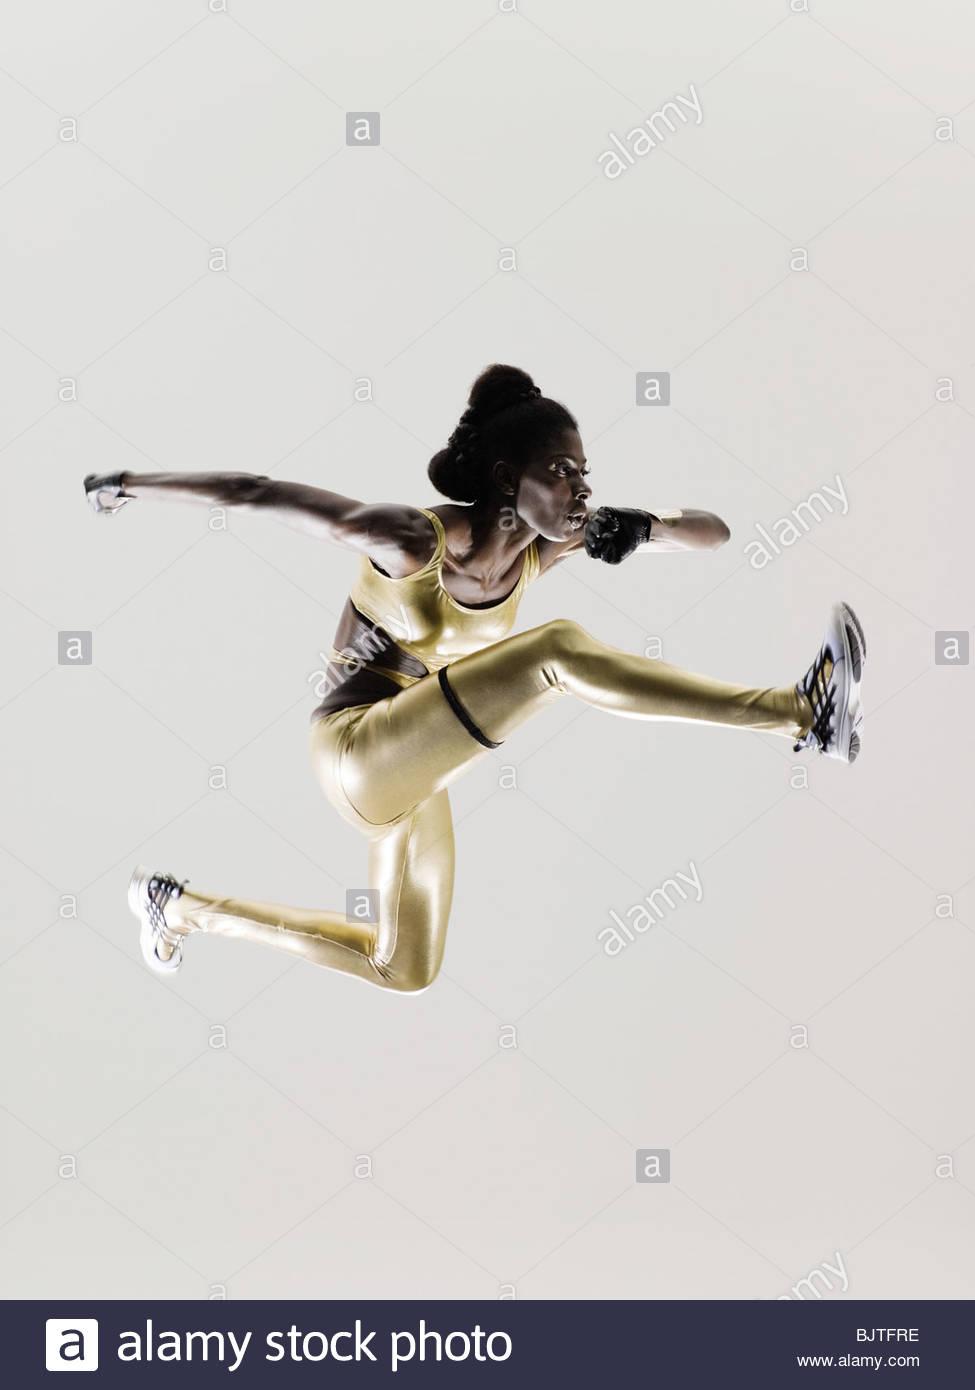 Un atleta jumping Immagini Stock